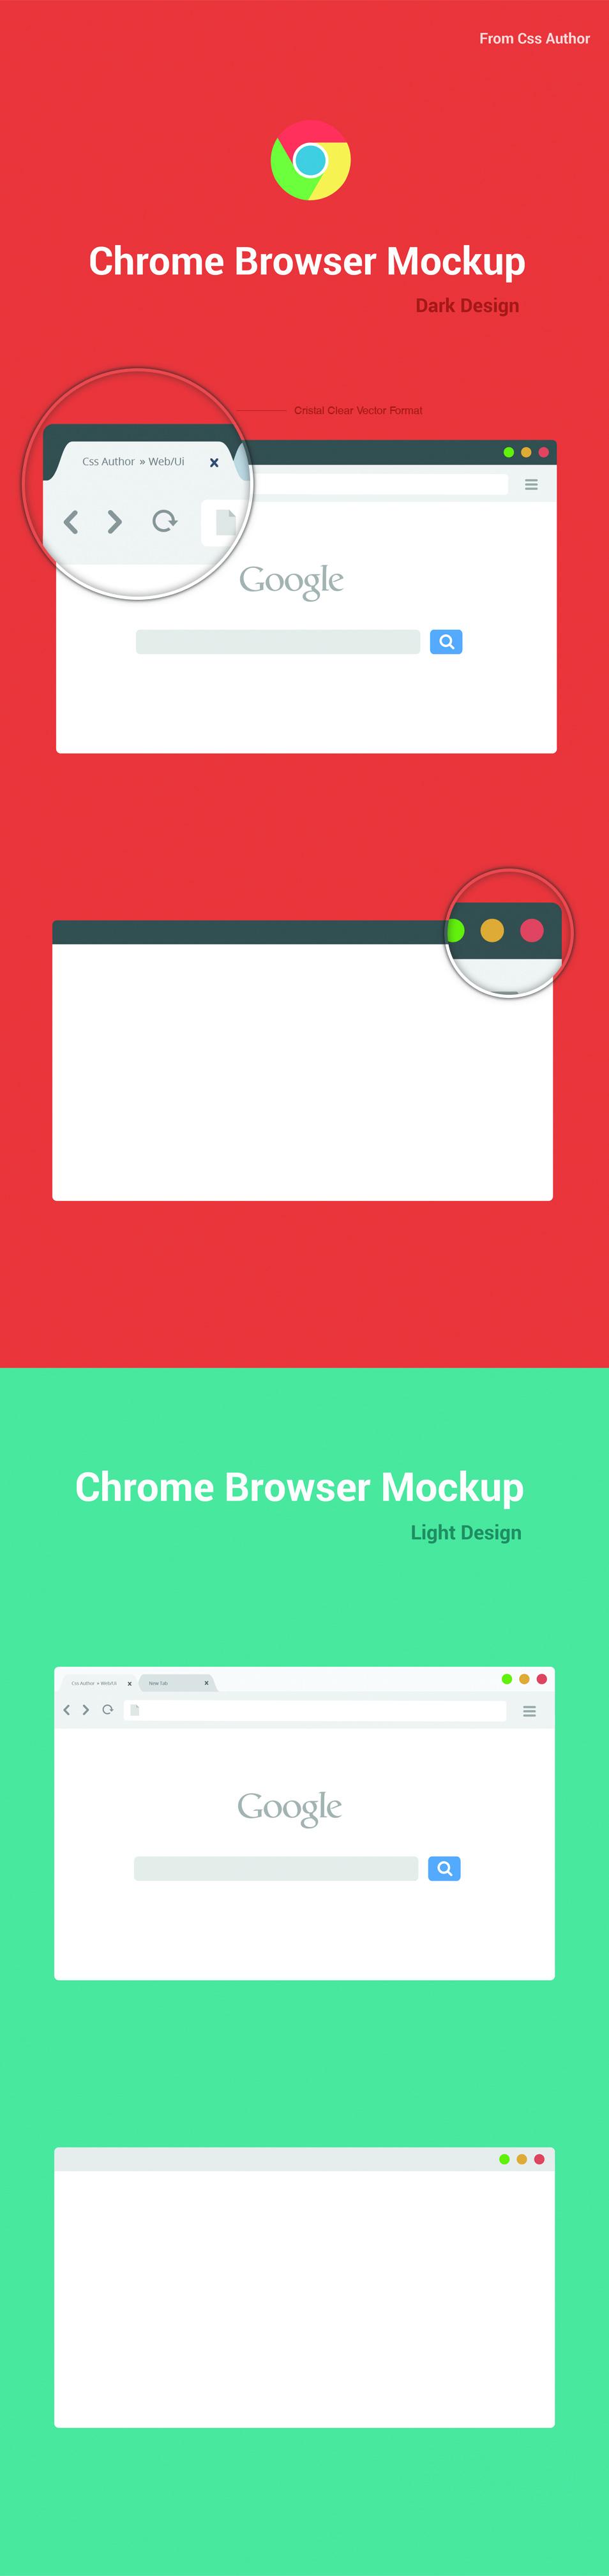 Free Chrome Browser Mockup Vector Mockup, Templates, Web